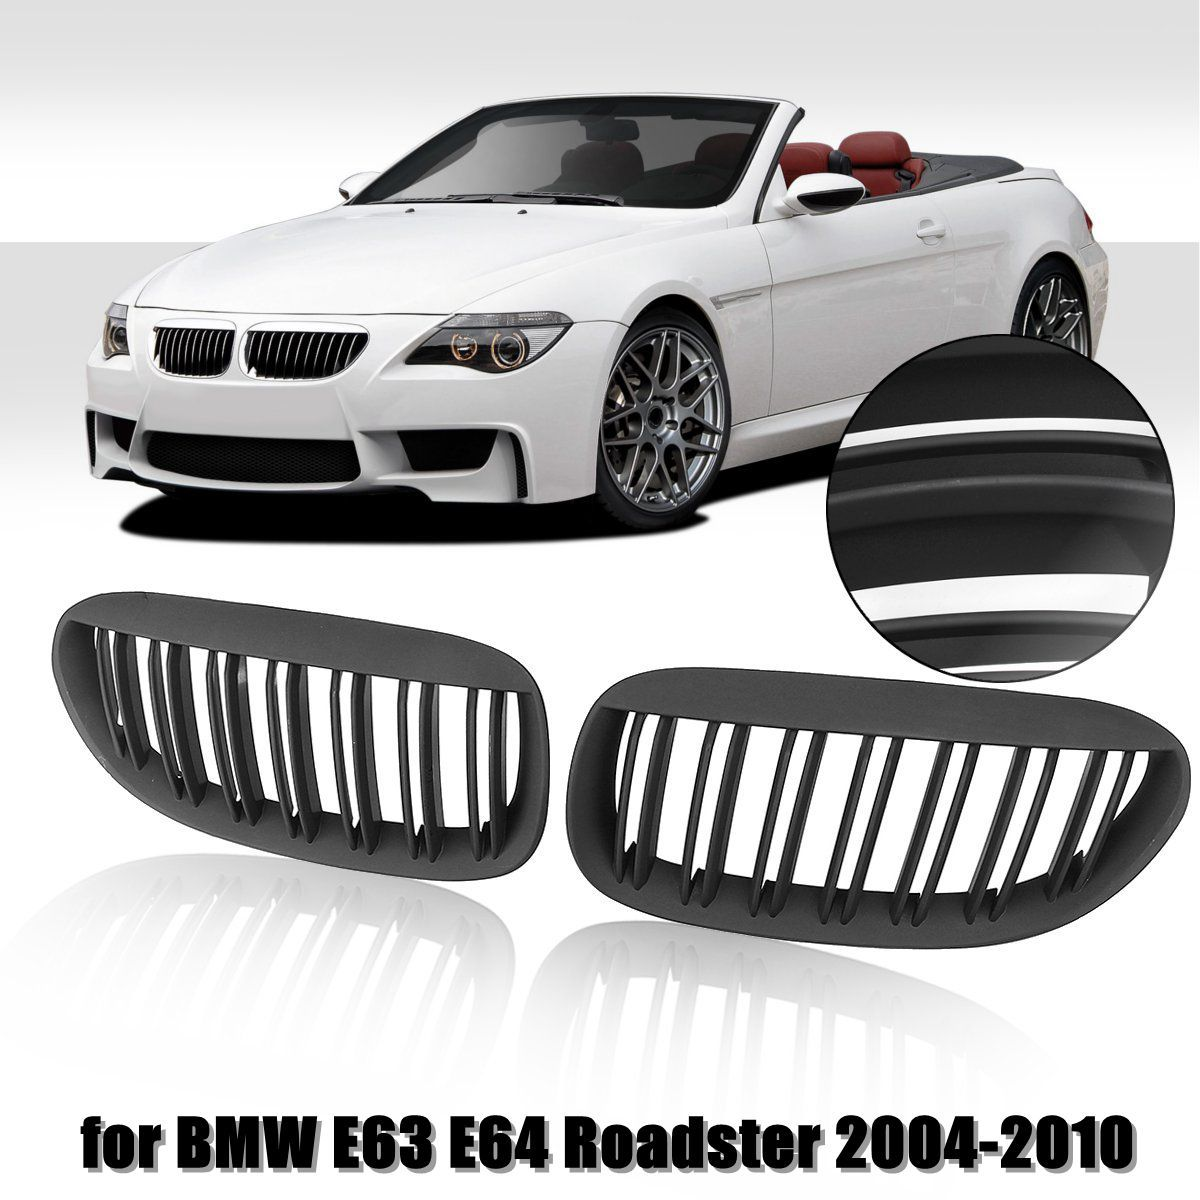 1 Pair Matte Black Double Slat Line Front Bumper Grille Kidney Grille For BMW E63 E64 Roadster 6 Series Convertible 2004-2010